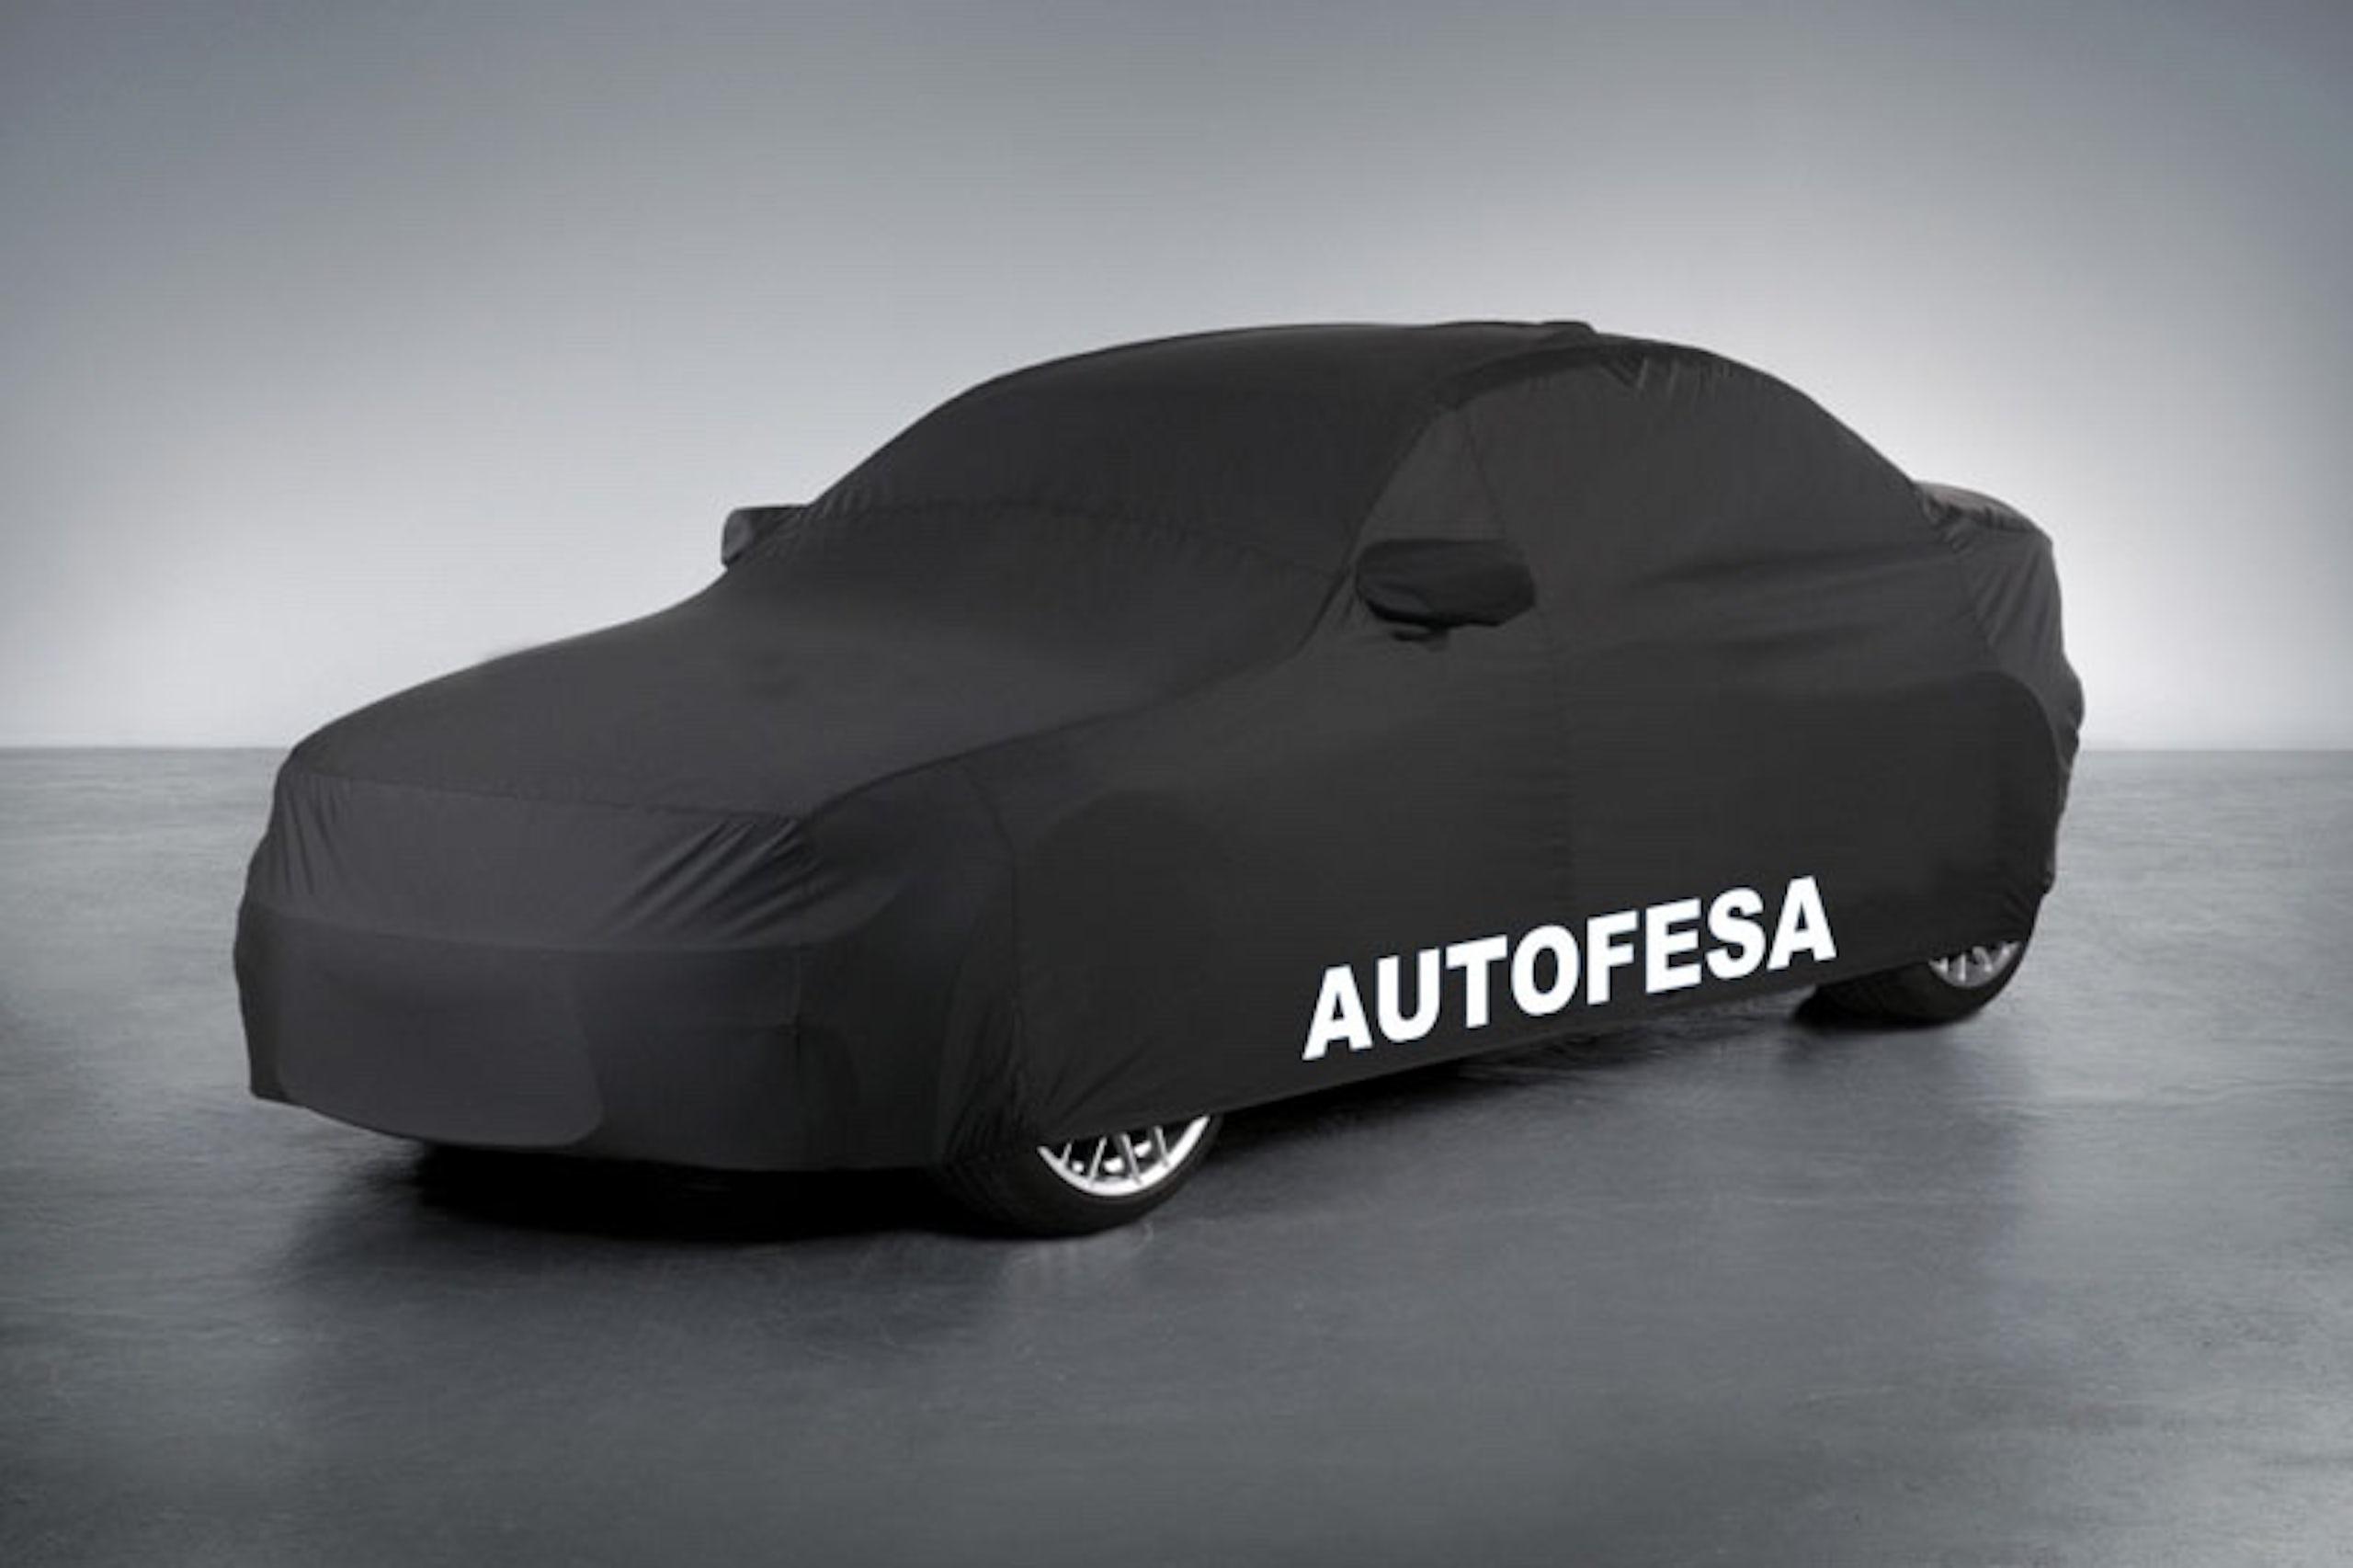 Audi A6 A6Avant COMPETITION ABT 3.0 TDI V6 T 326cv quattro 5p S tronic 4x4 Cpmpetition ABT S/S - Foto 22